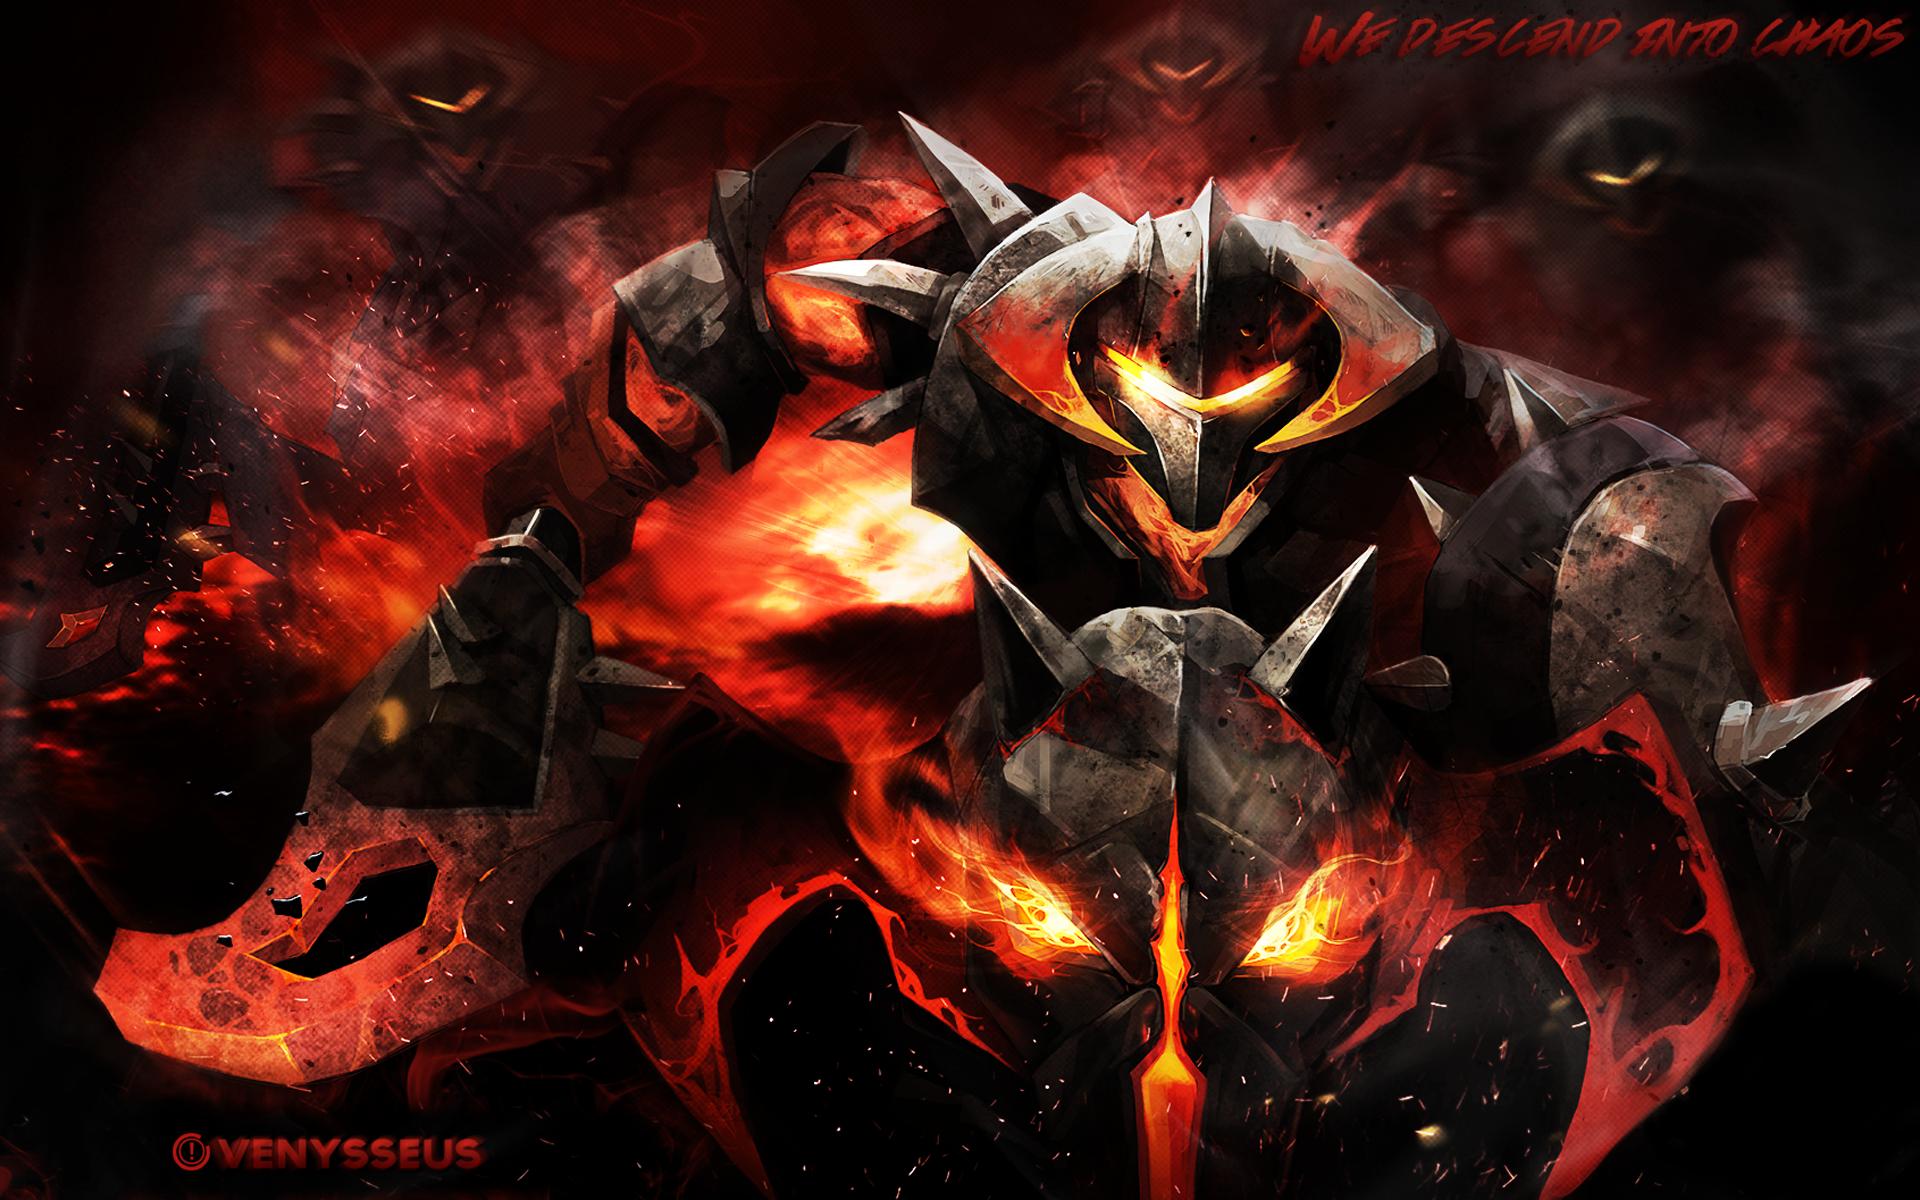 Dota 2 Wallpaper 2 Edit - Chaos Knight by VenysseusDOTA